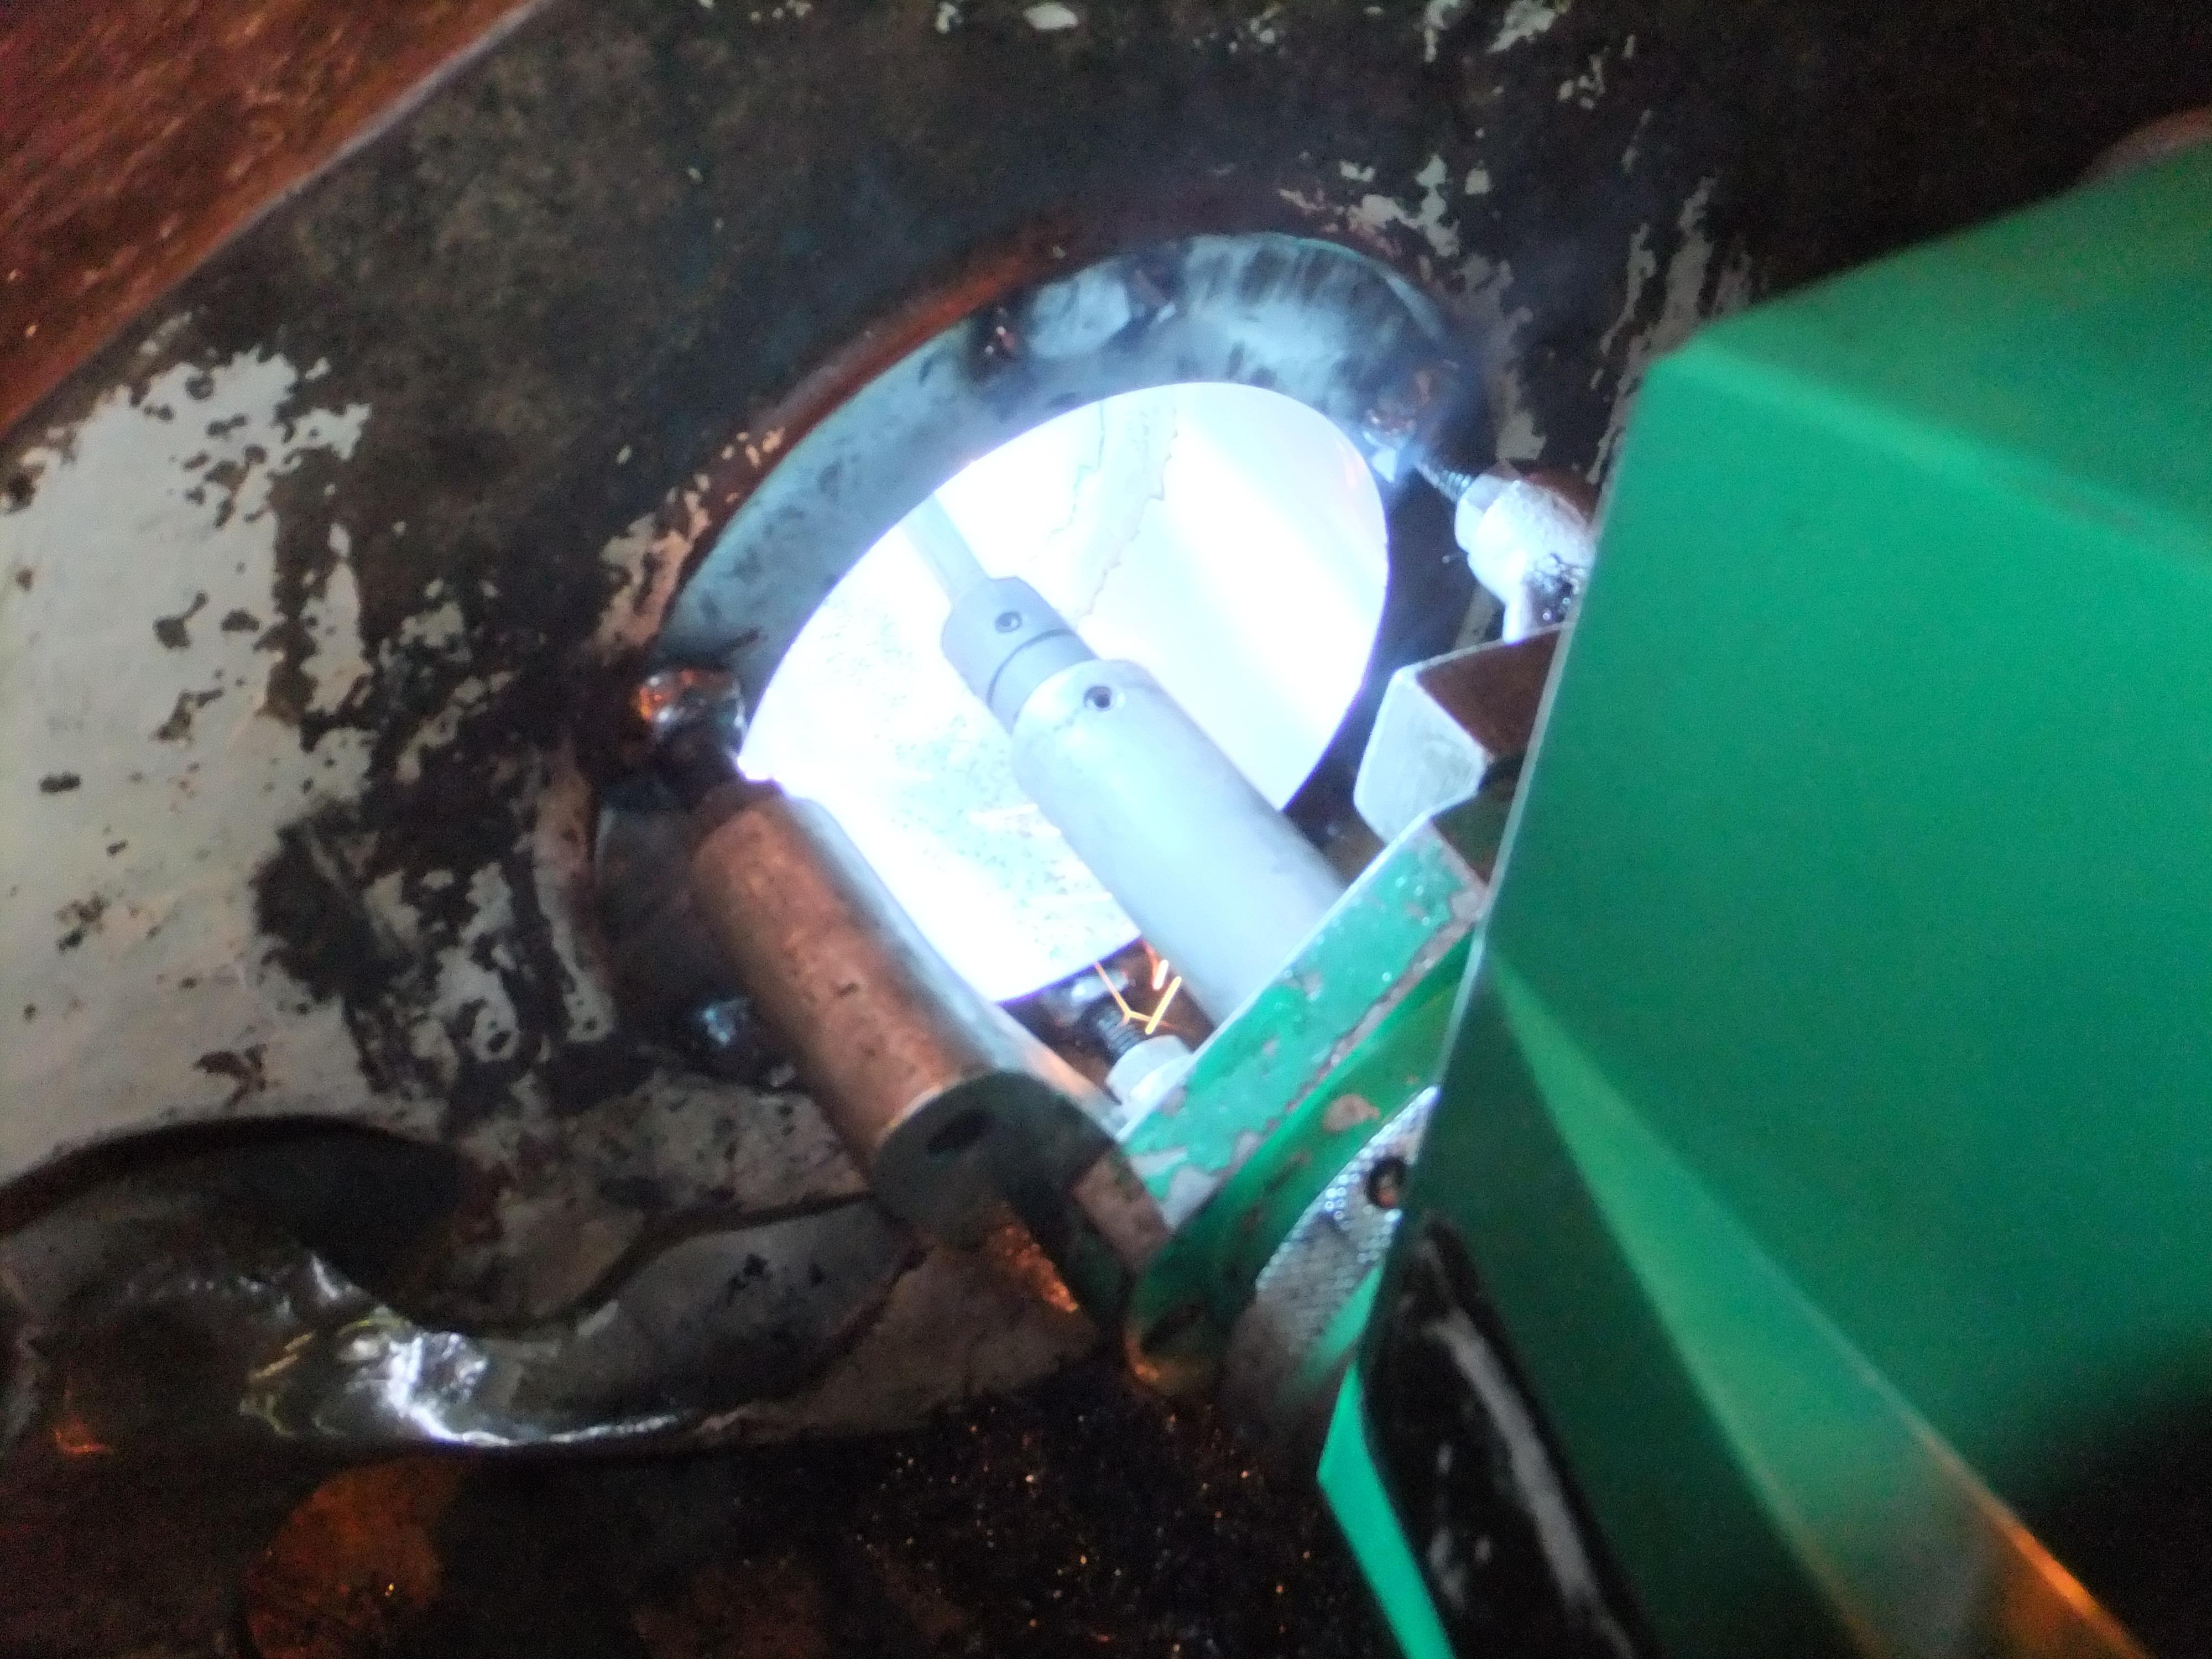 Cummins Engineering Ltd - Bucket Repairs - Line Boring